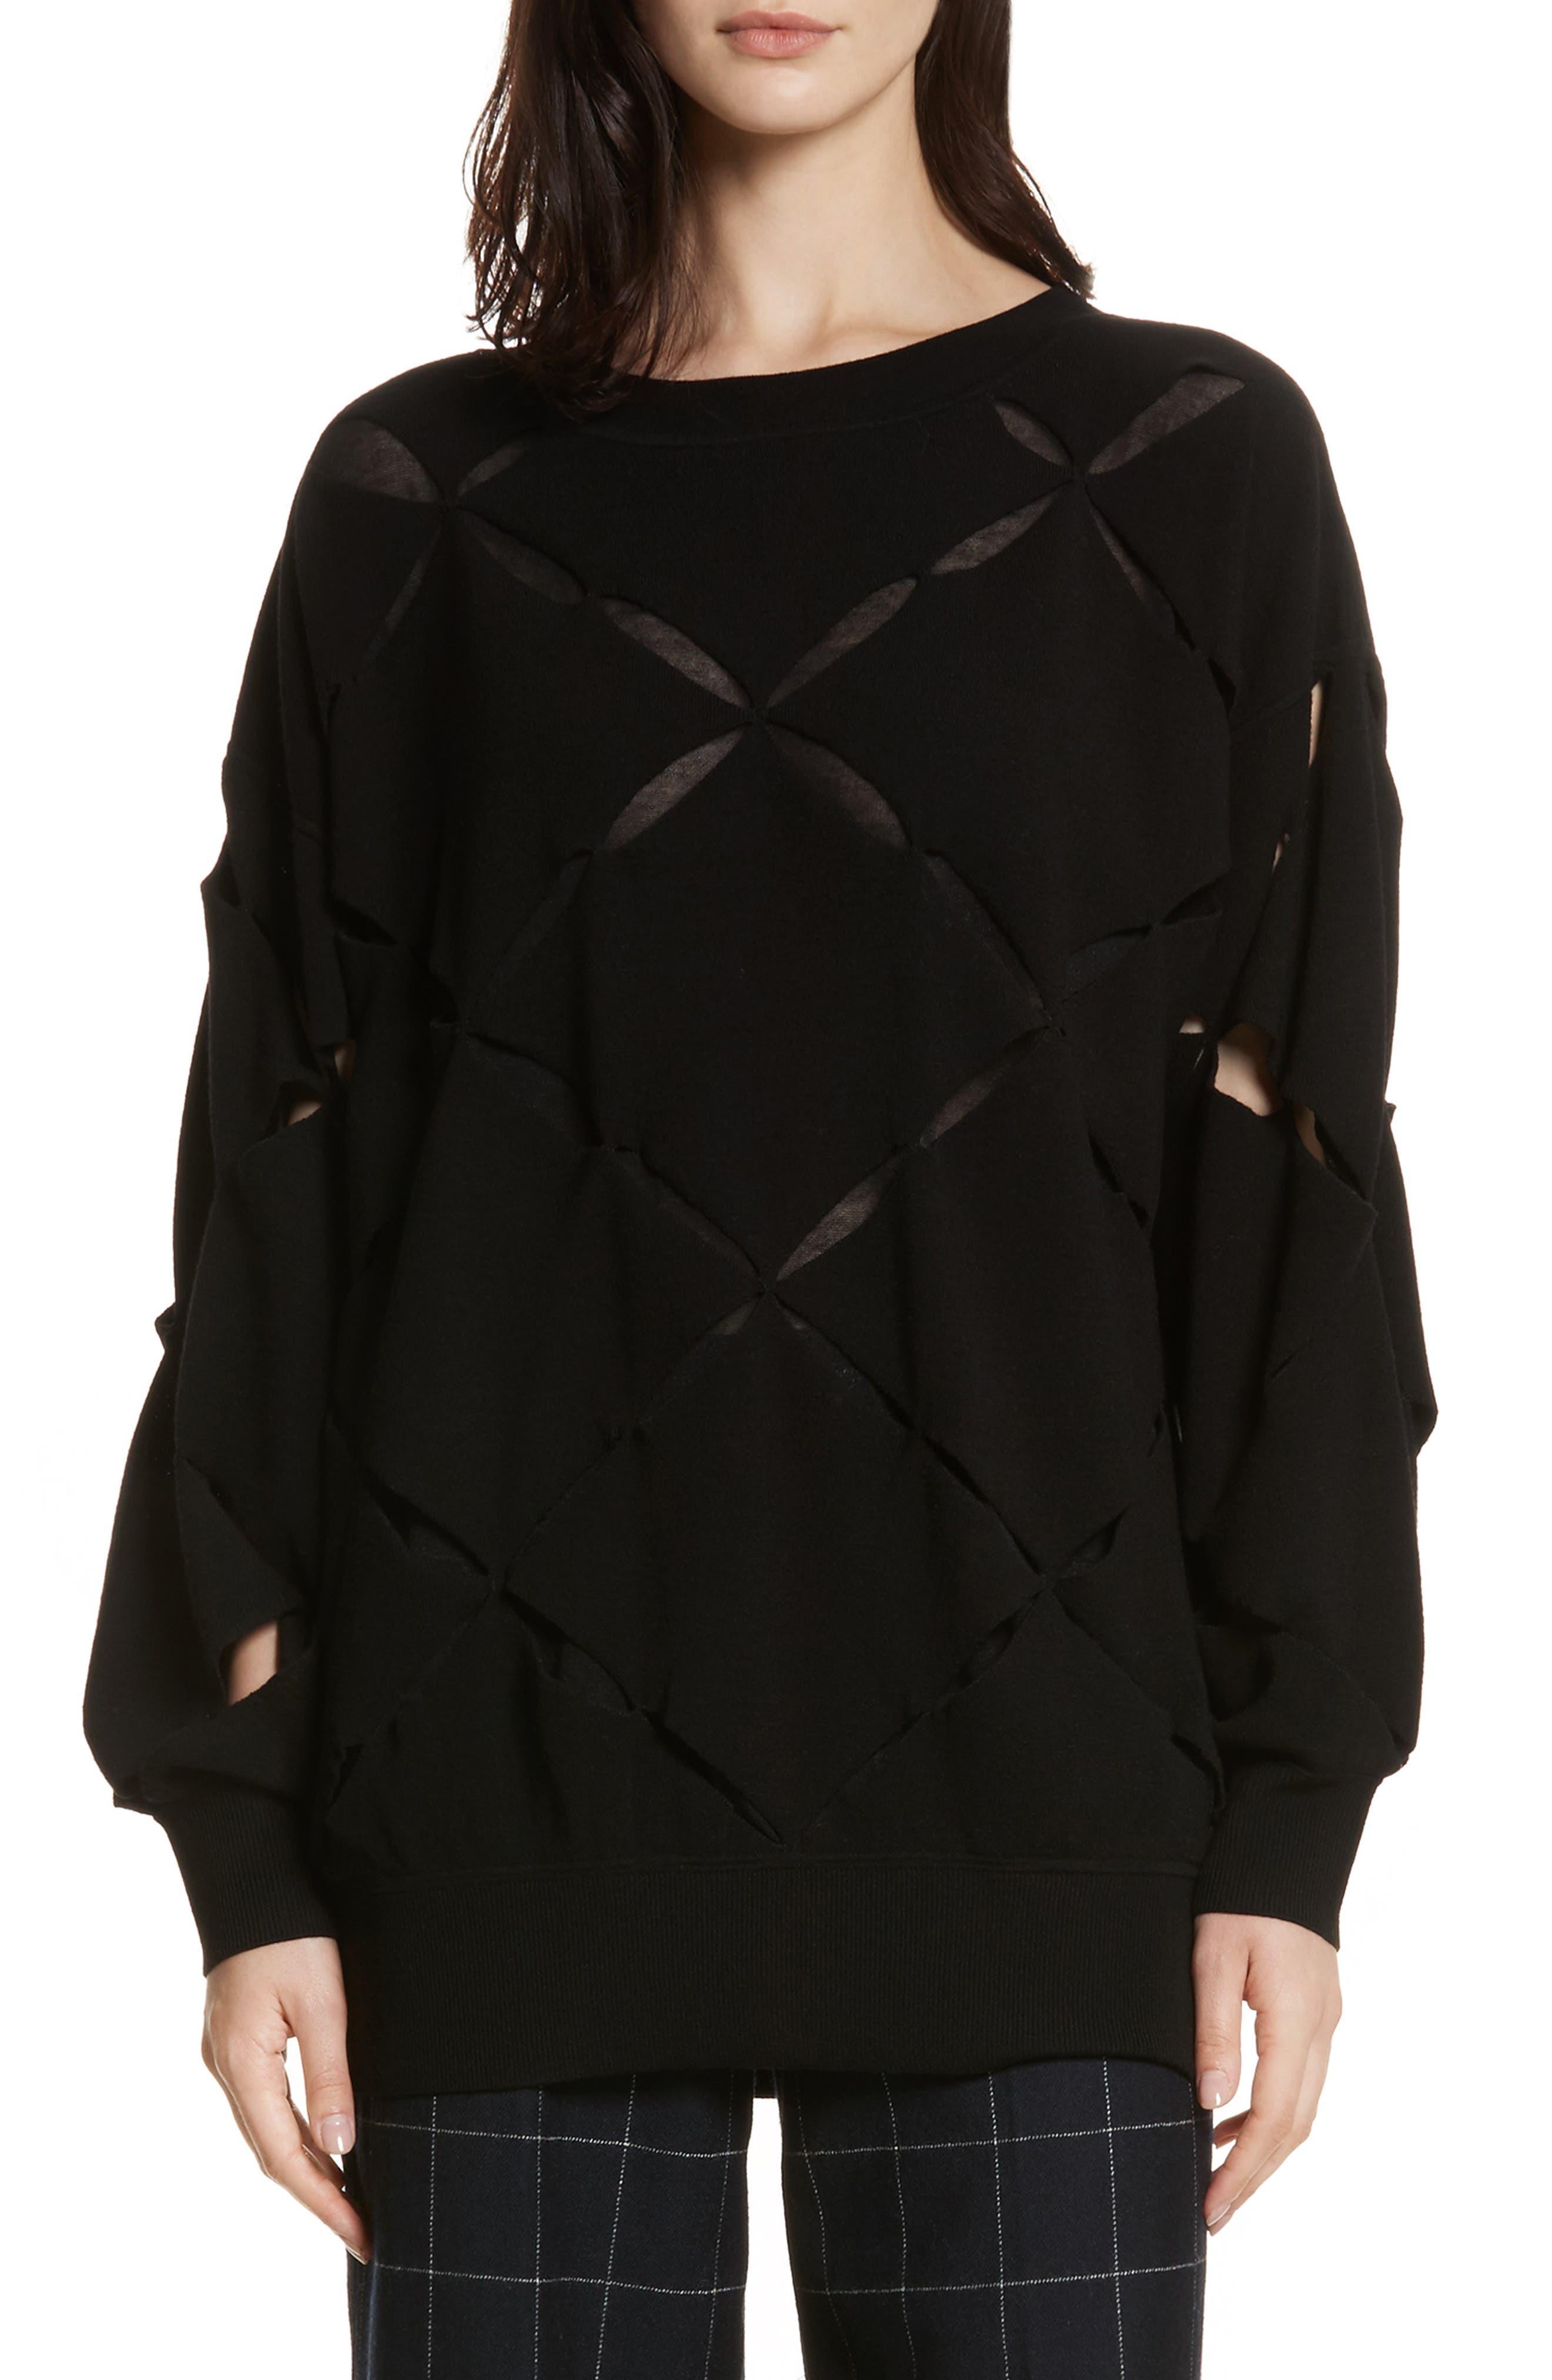 Roz Cutout Sweater,                         Main,                         color, Black